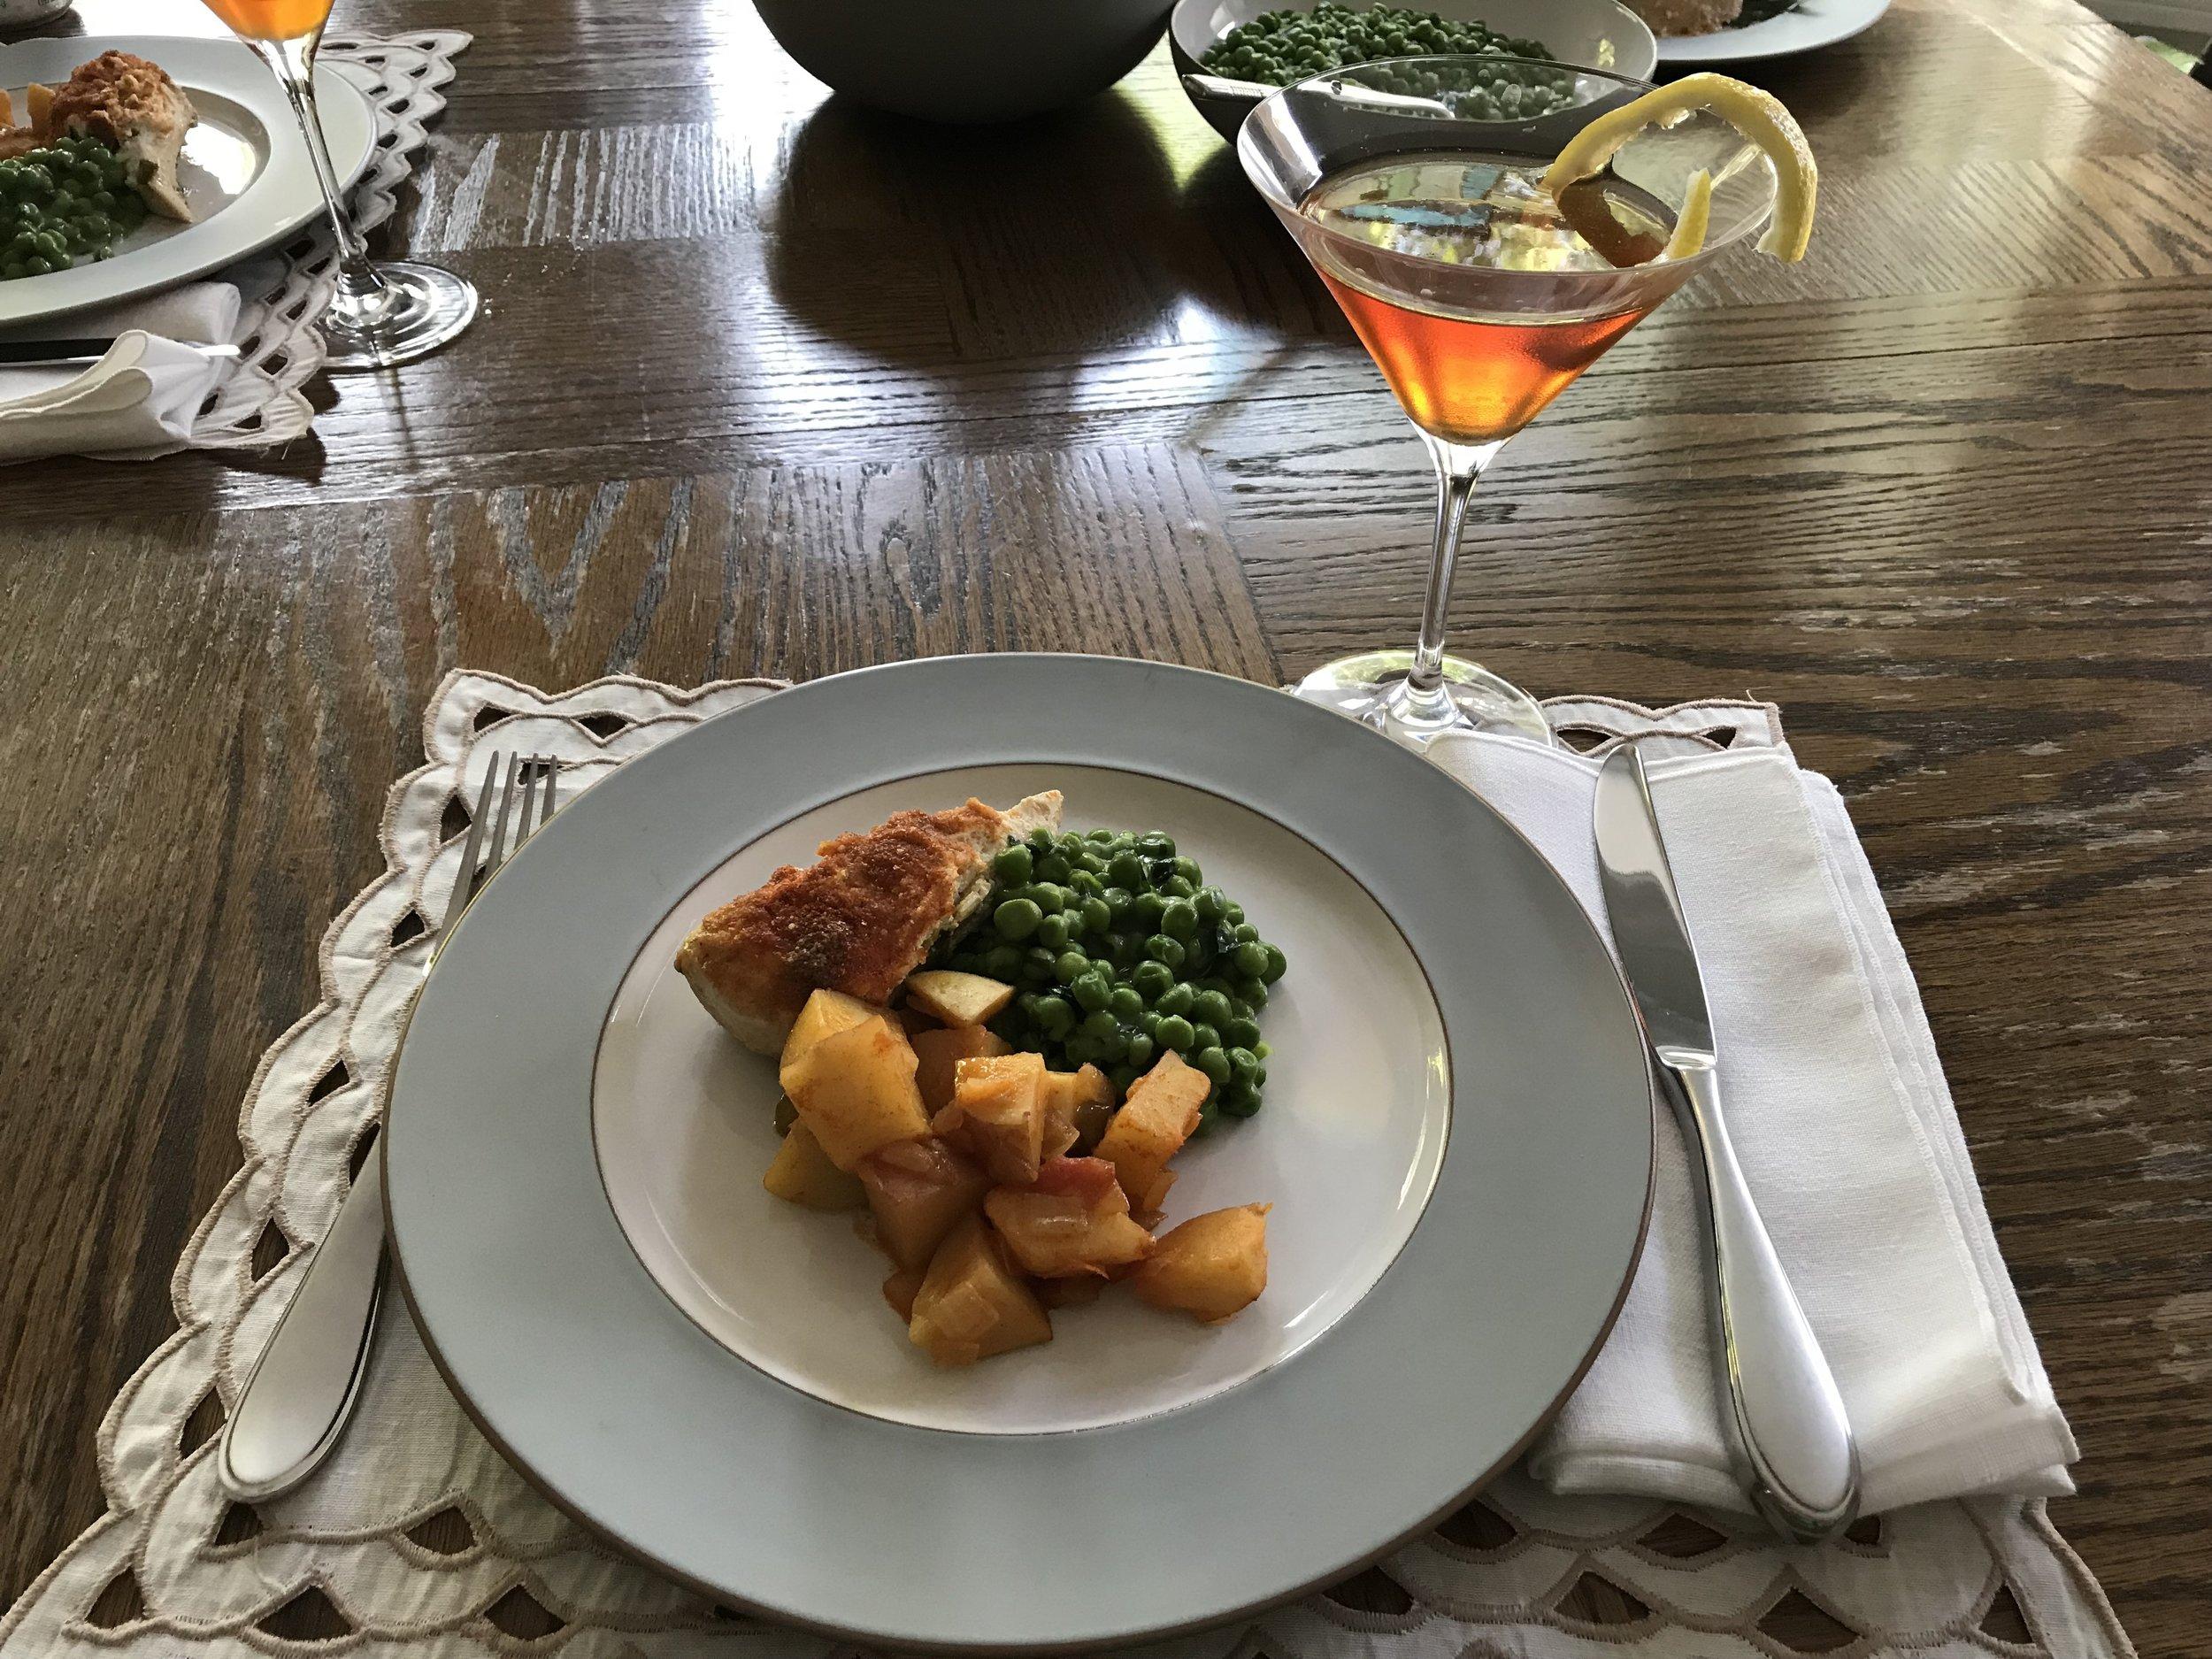 Hungarian Dinner with Zwakhatten